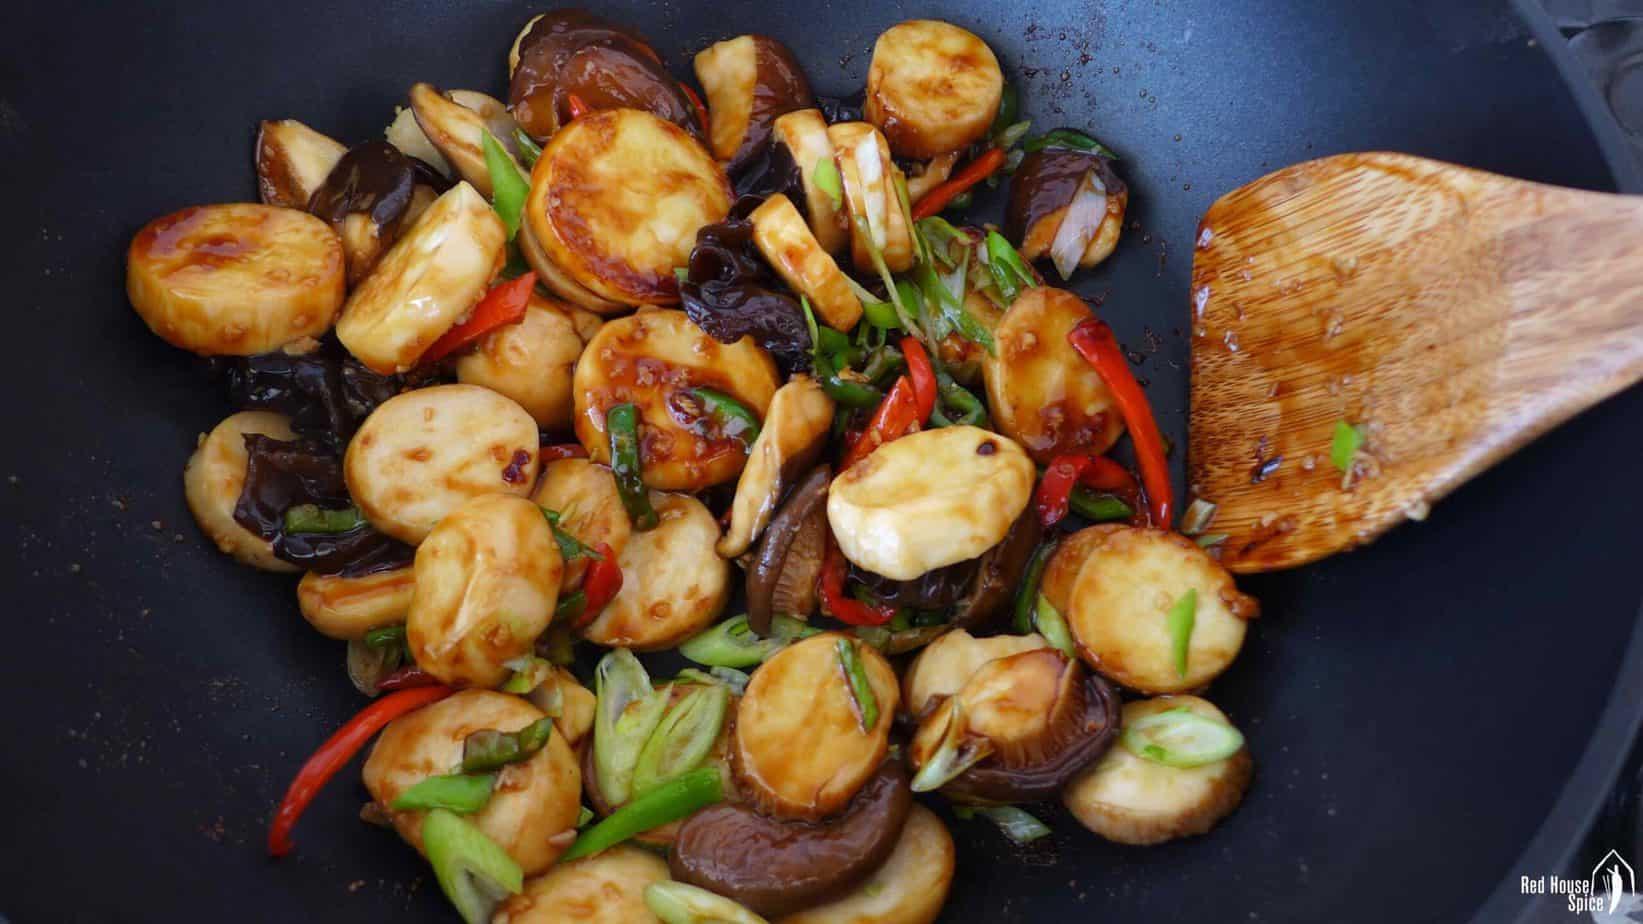 Mushroom fried in a wok